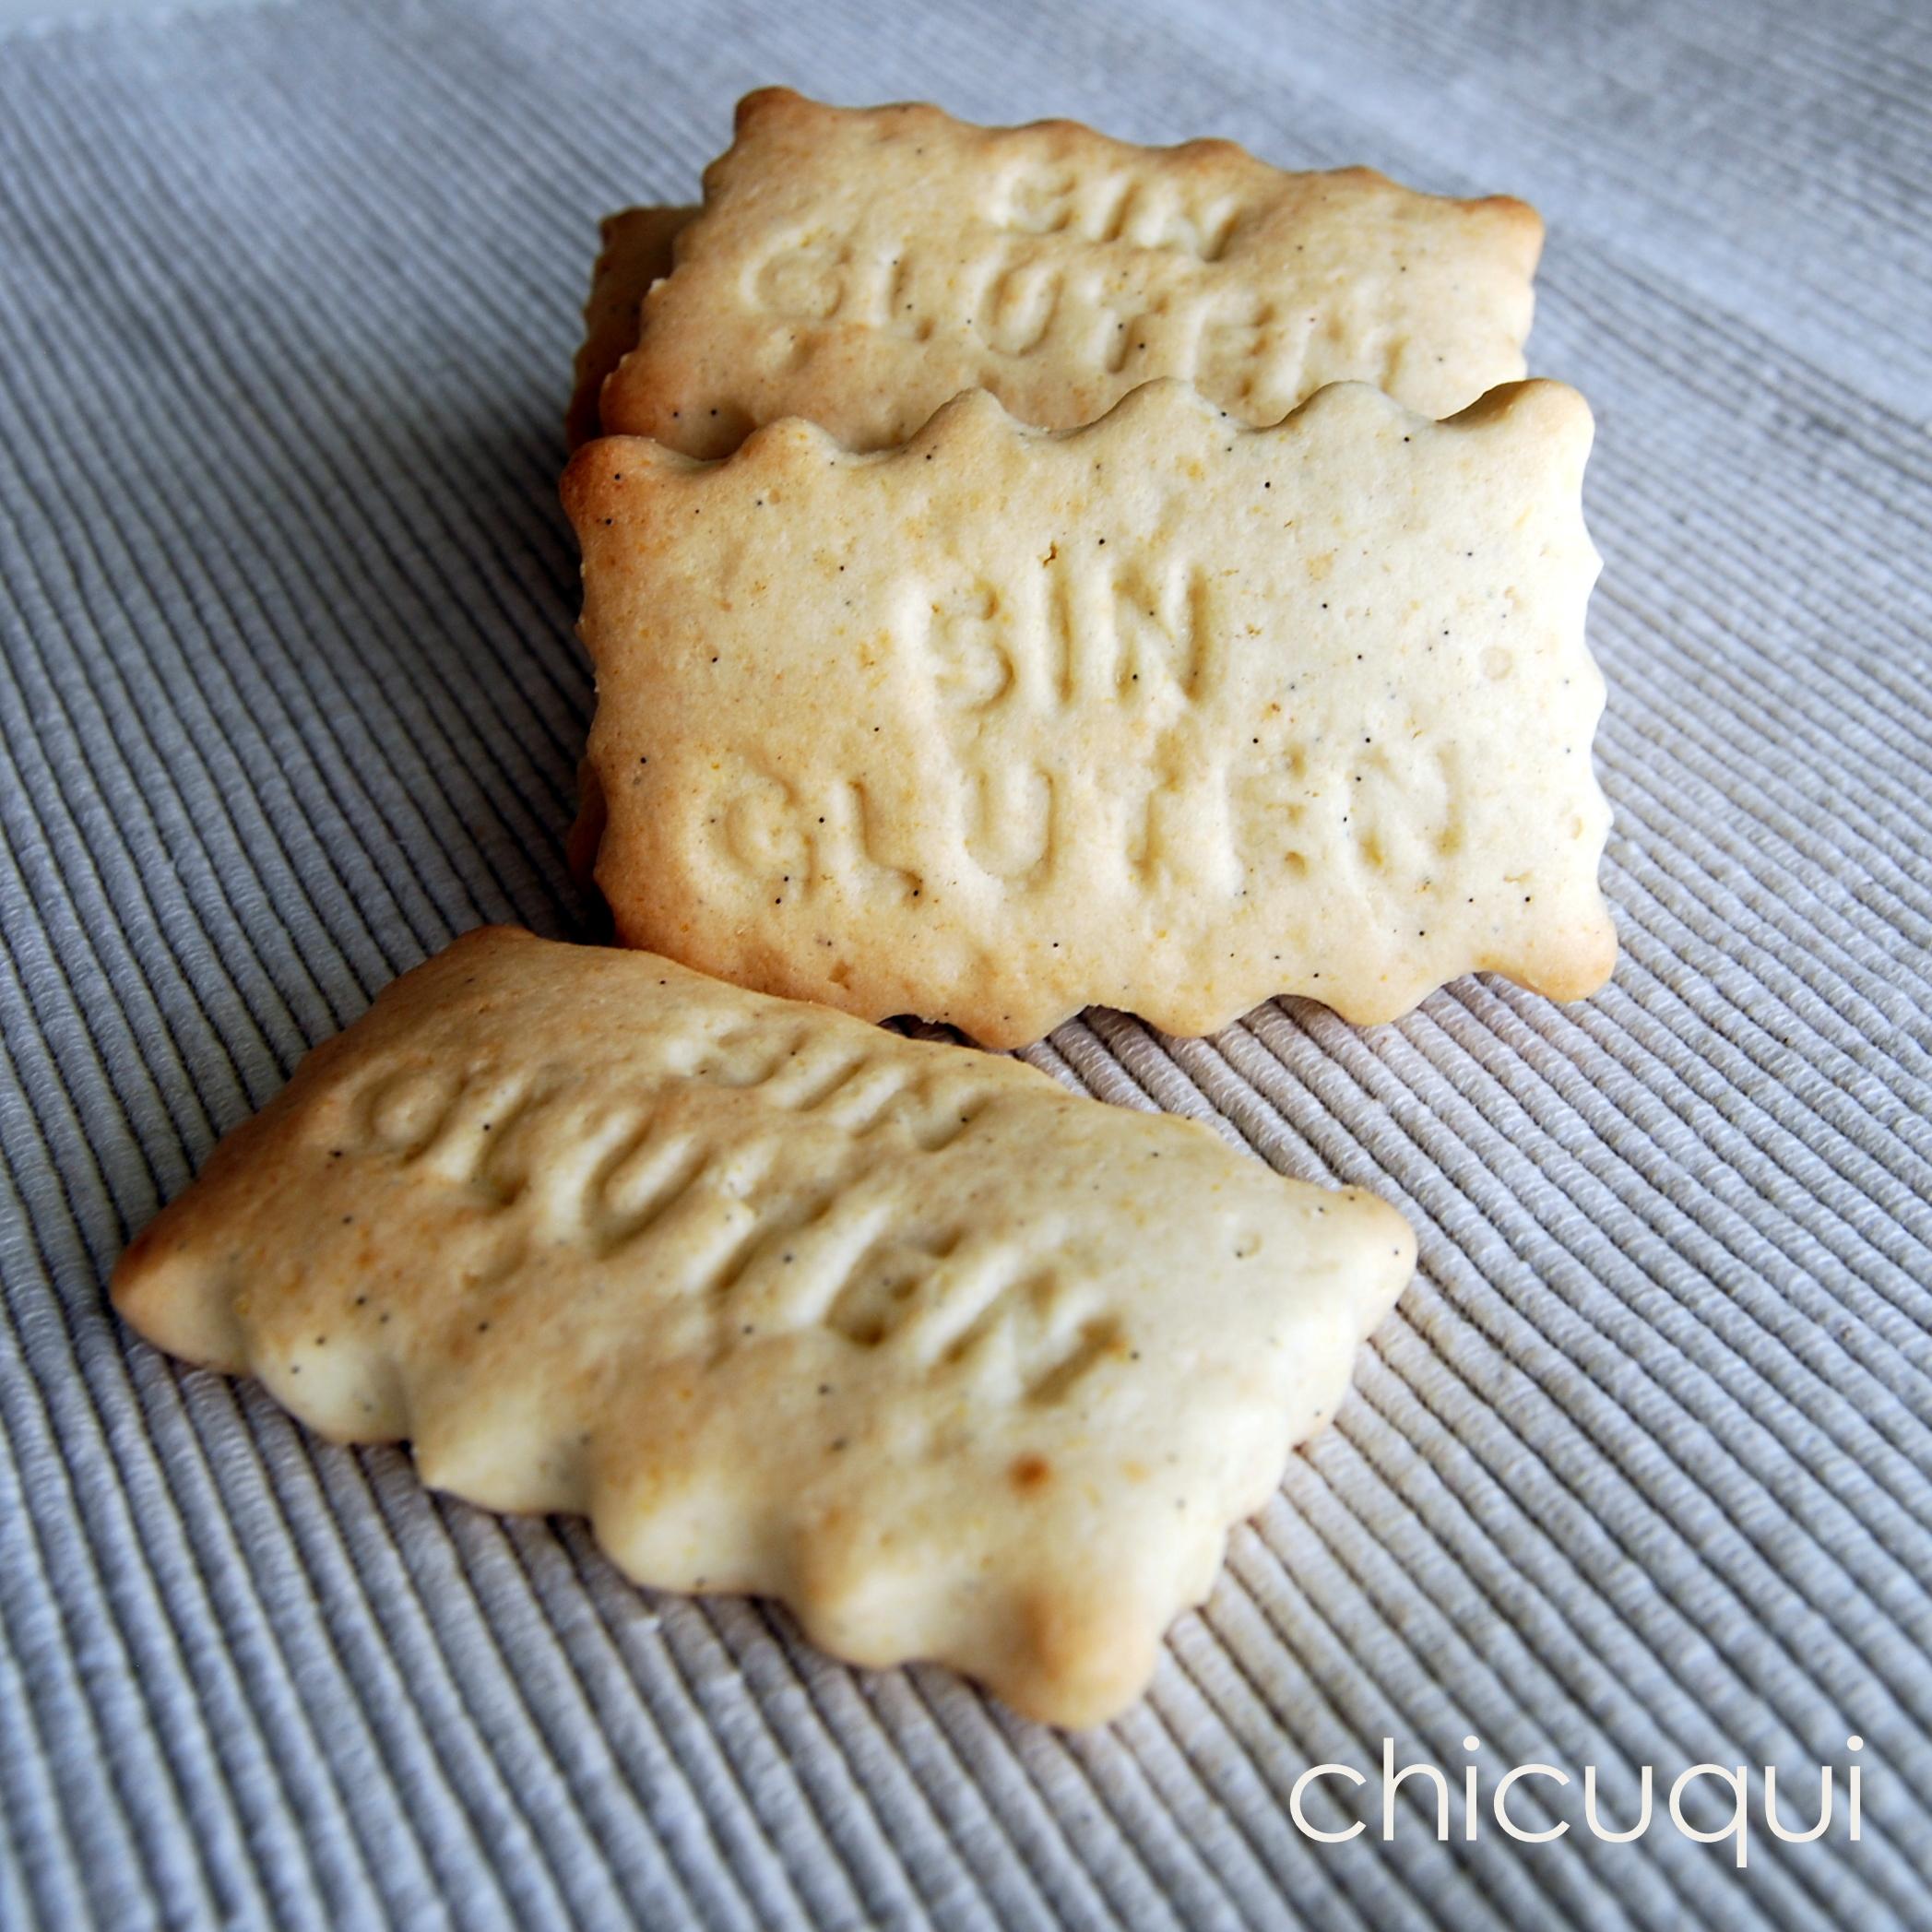 C mo hacer galletas decoradas sin gluten